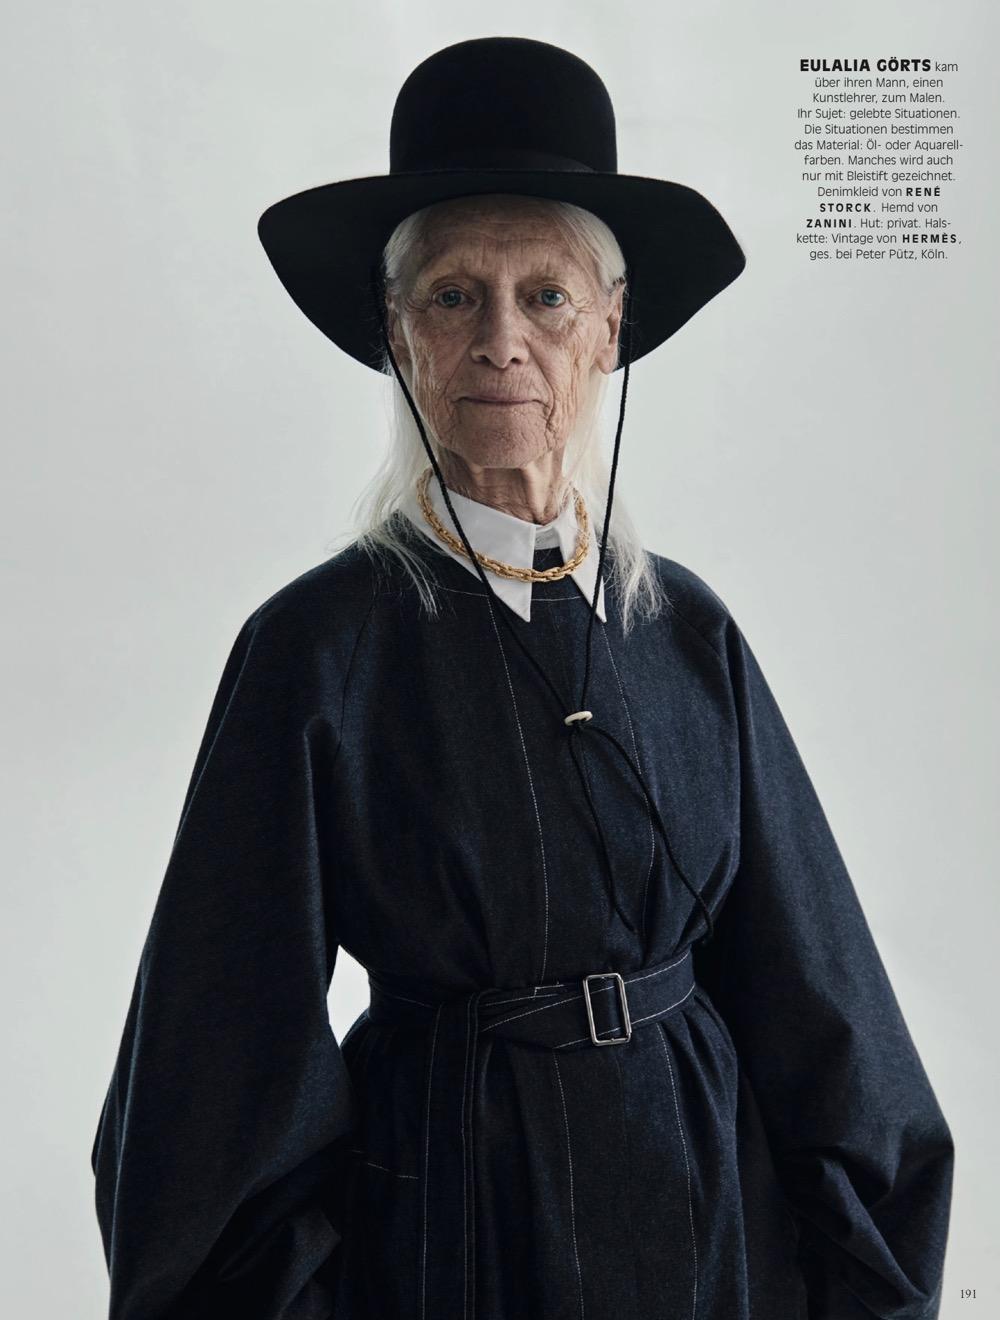 Vogue Germany /w Claudia Knoepfel / Styling Nicola Knels